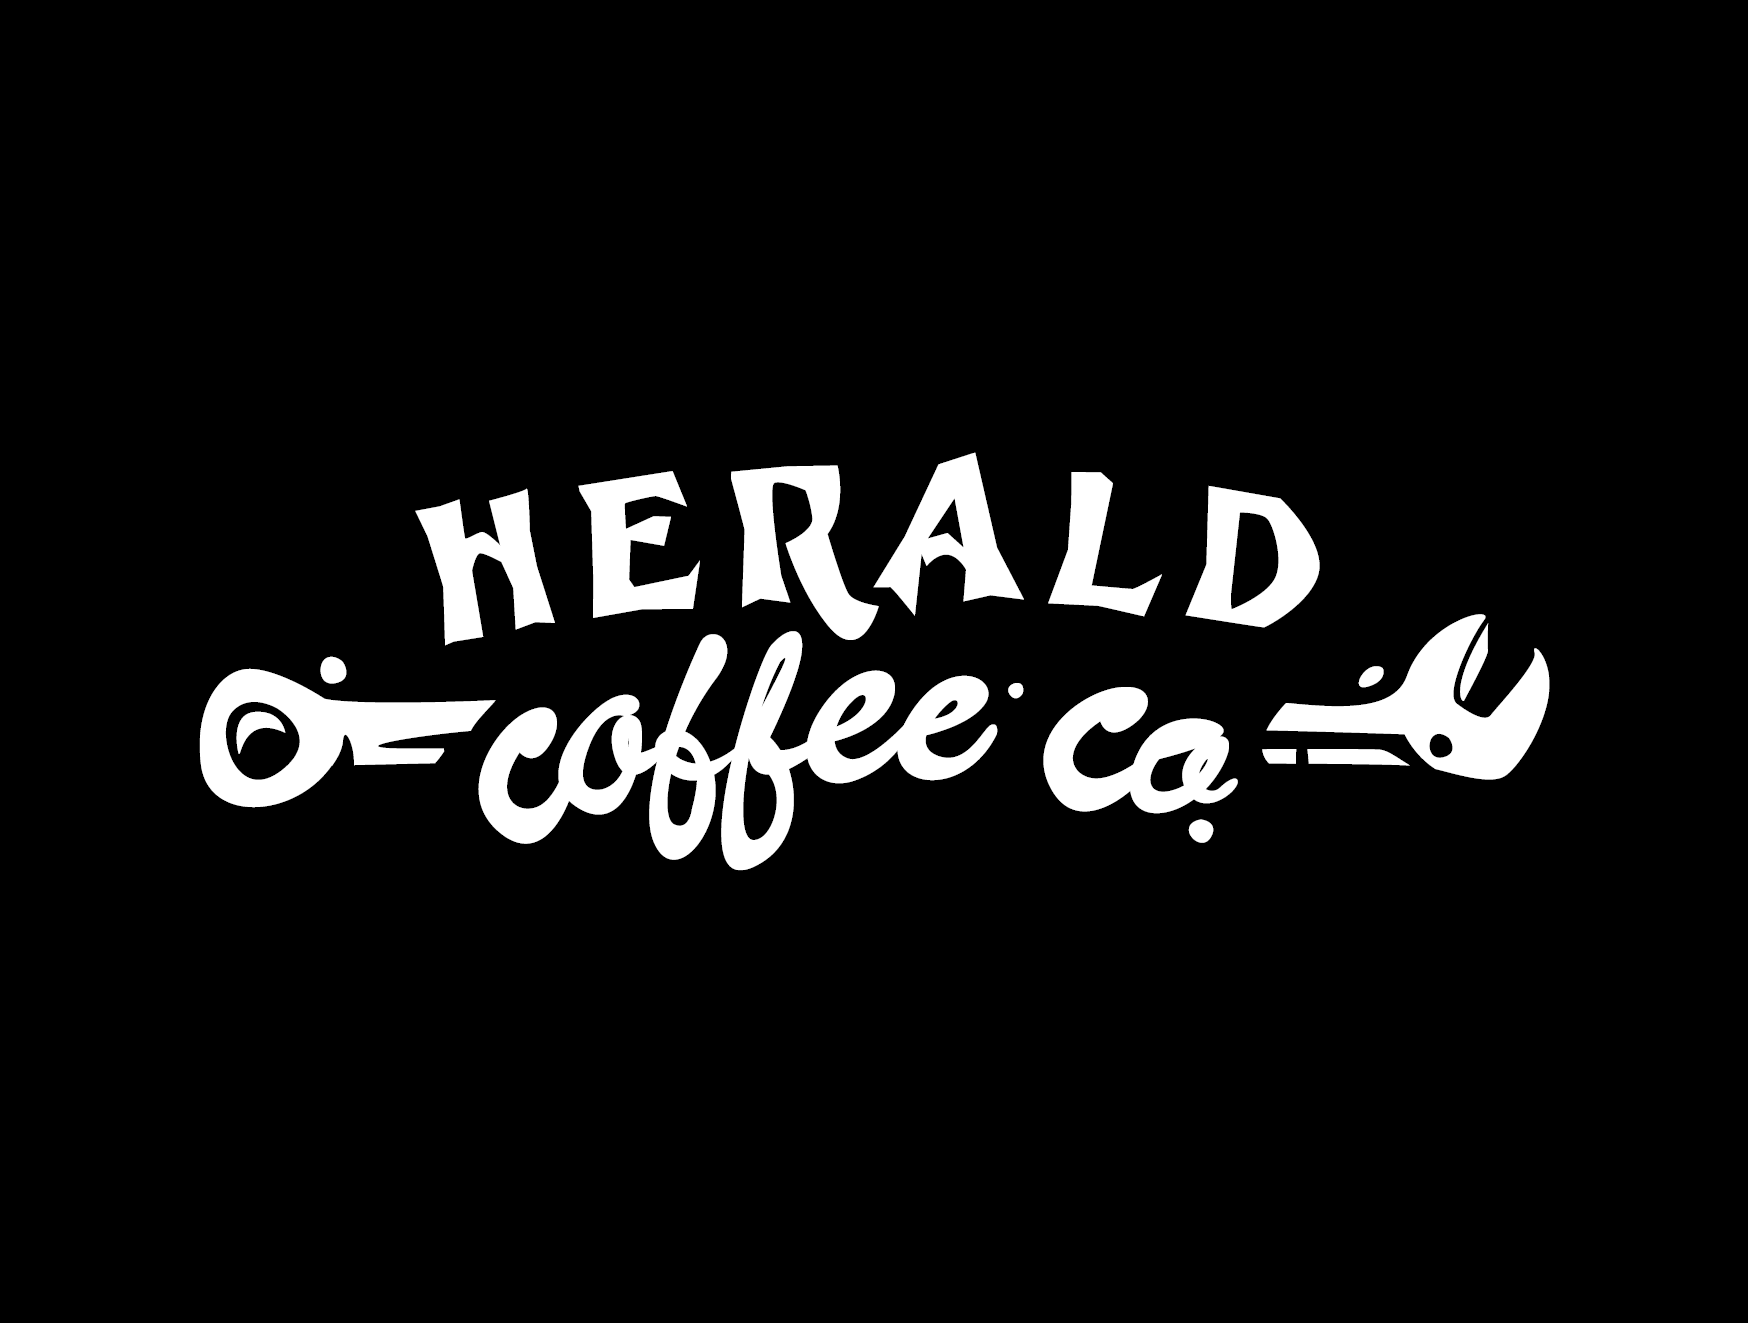 HERALD COFFEE BRAND